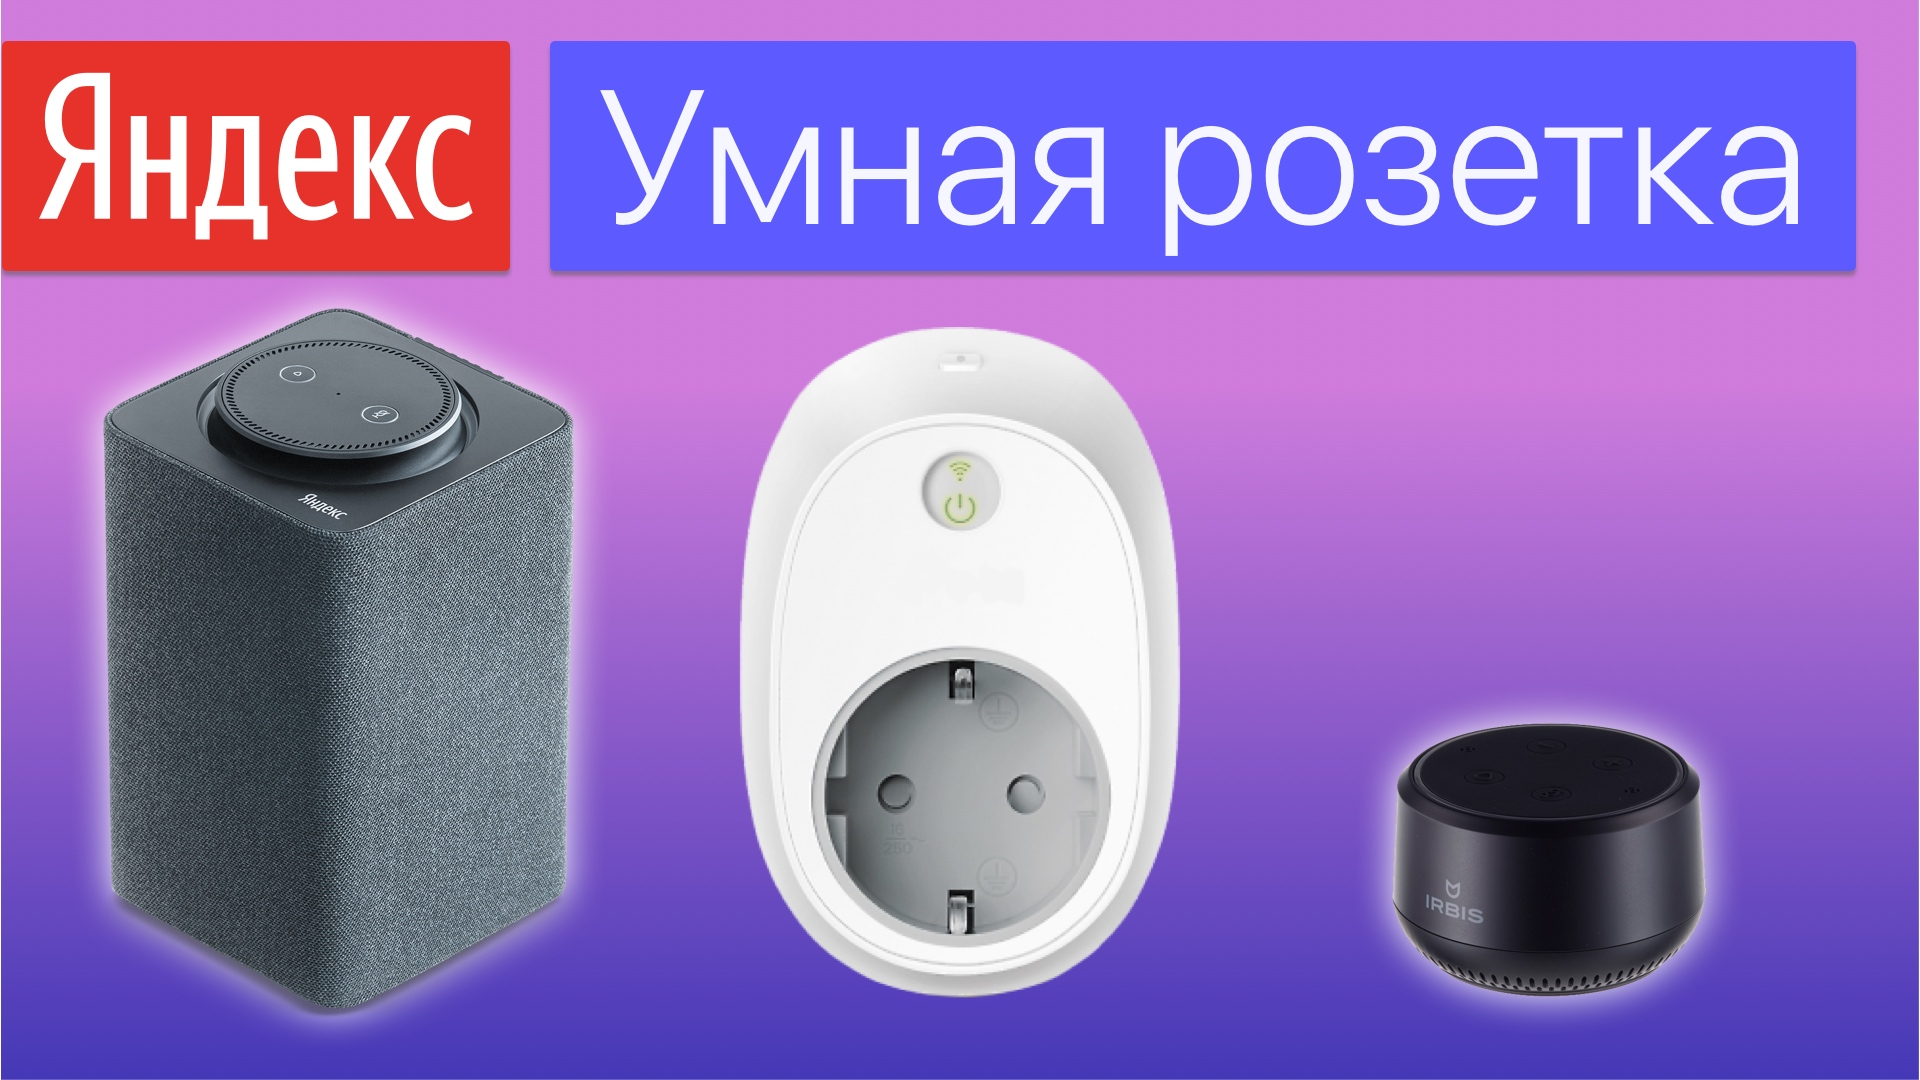 Обзор Yandex дома и розетки